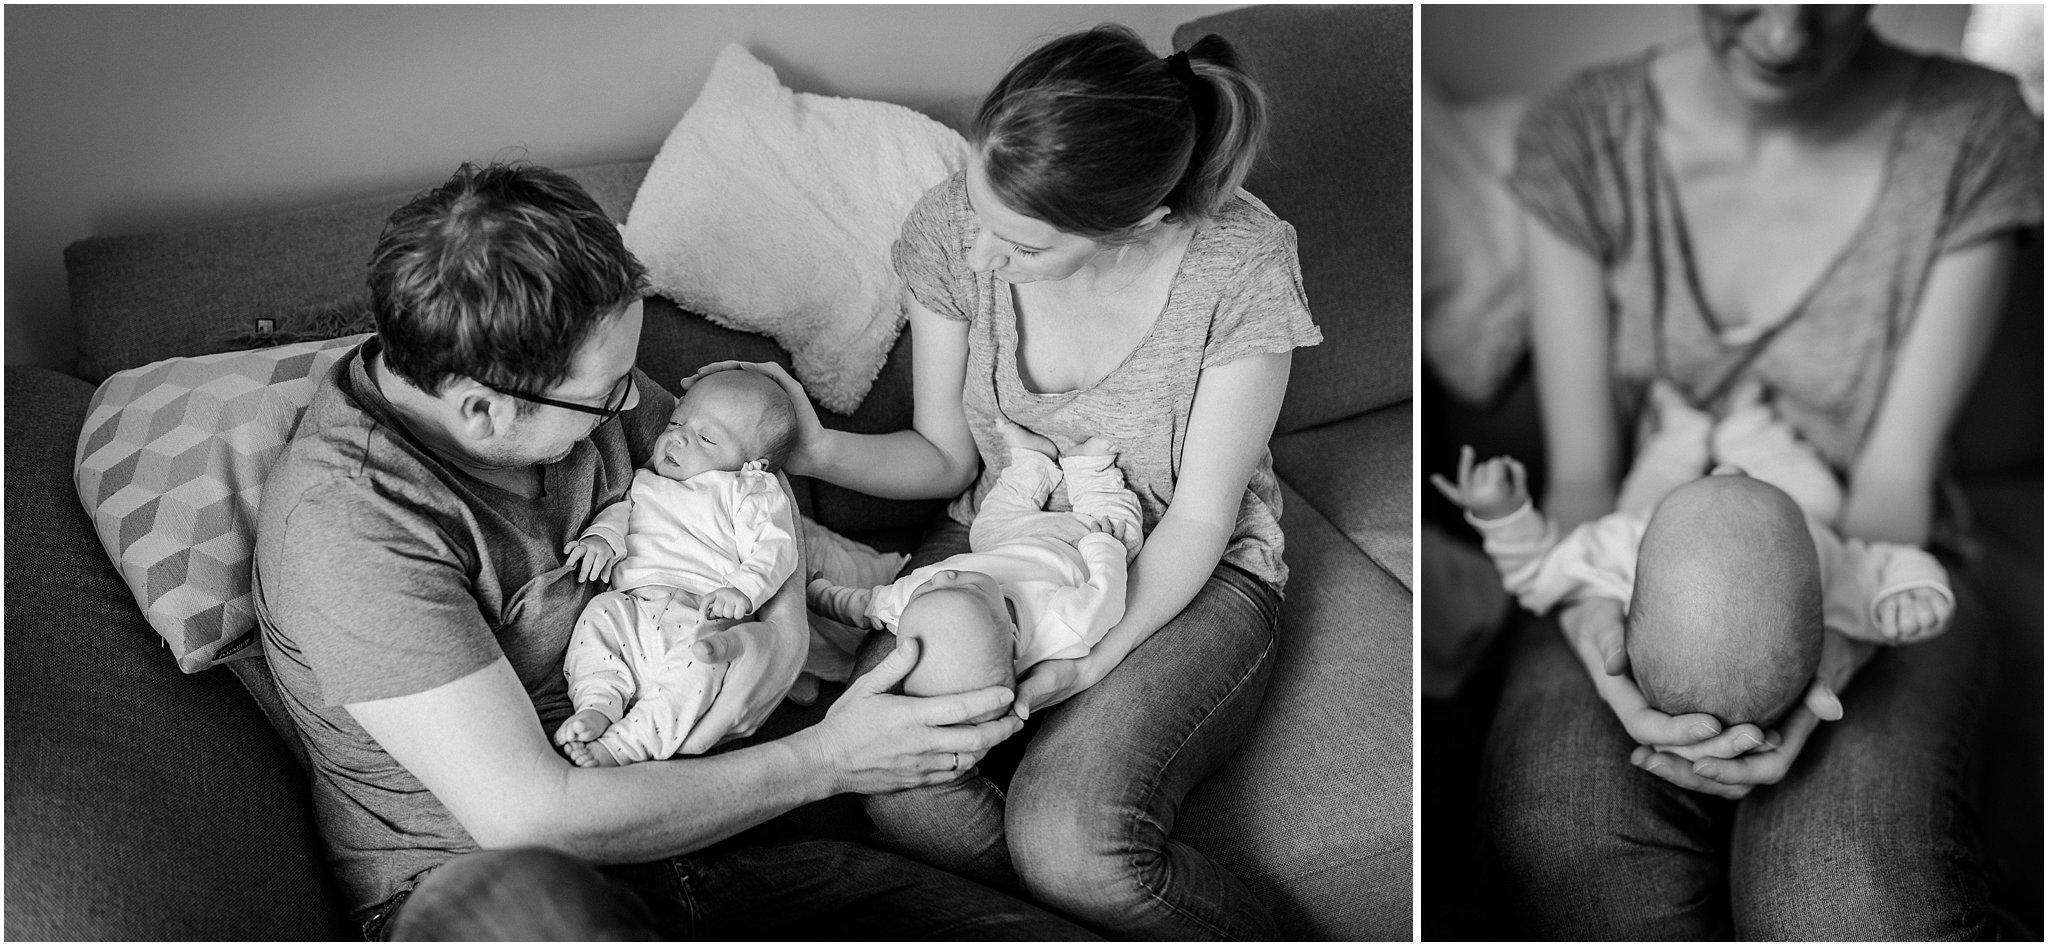 Familienfotos mit Zwillingen